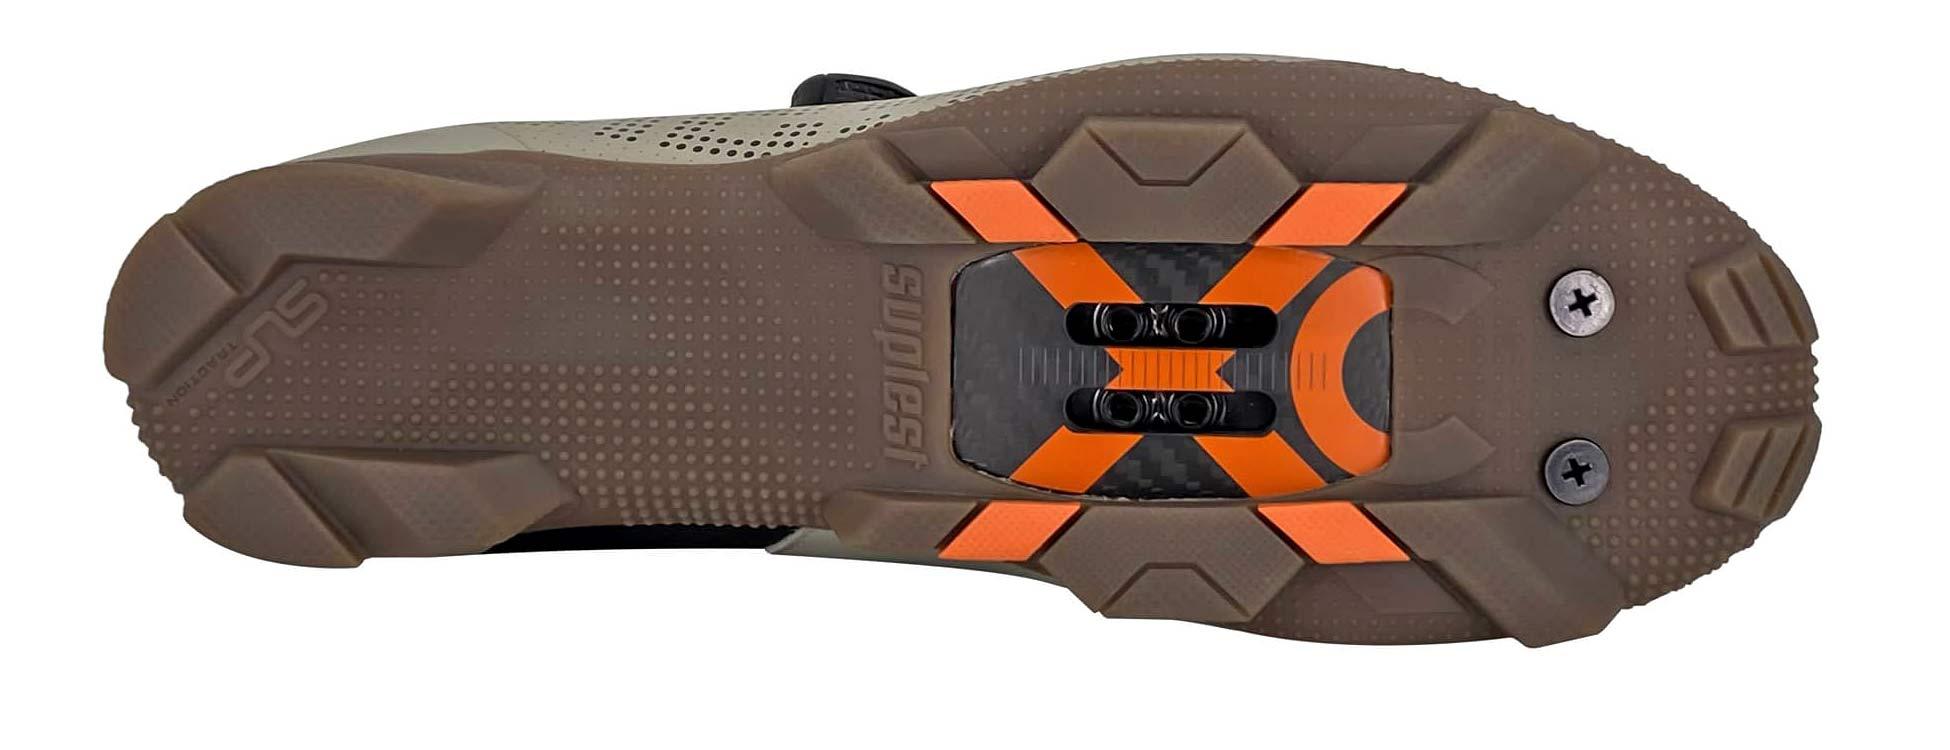 Suplest Gravel cycling shoe, OPEN-Suplest collaboration EDGEplus XC Gravel bike shoesSwiss Alpine gravel grey,sole